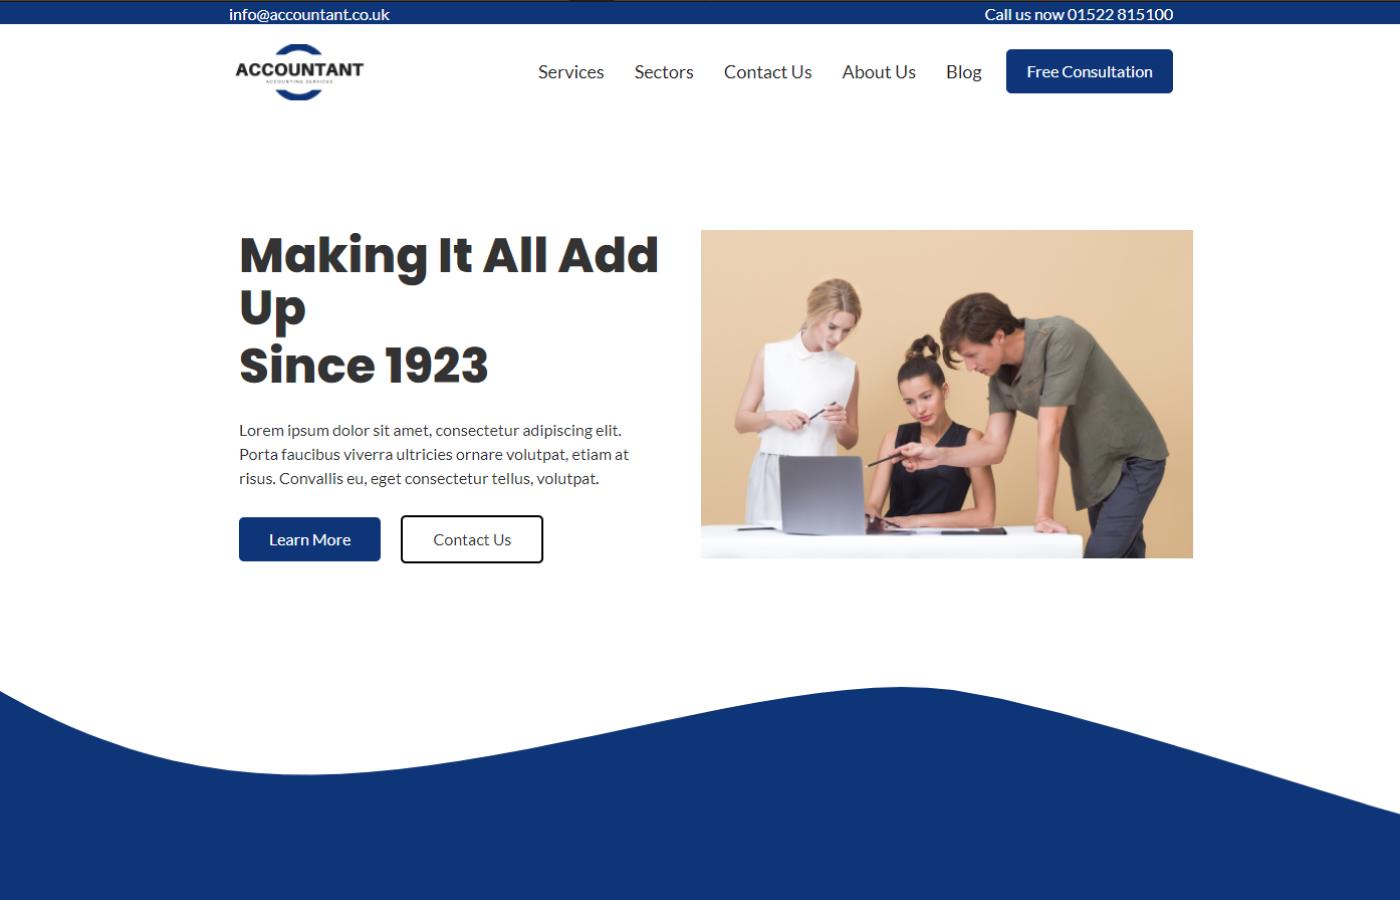 An Accounting template website designed and built by Brett Hudson Freelance Web Designer and Webflow Developer